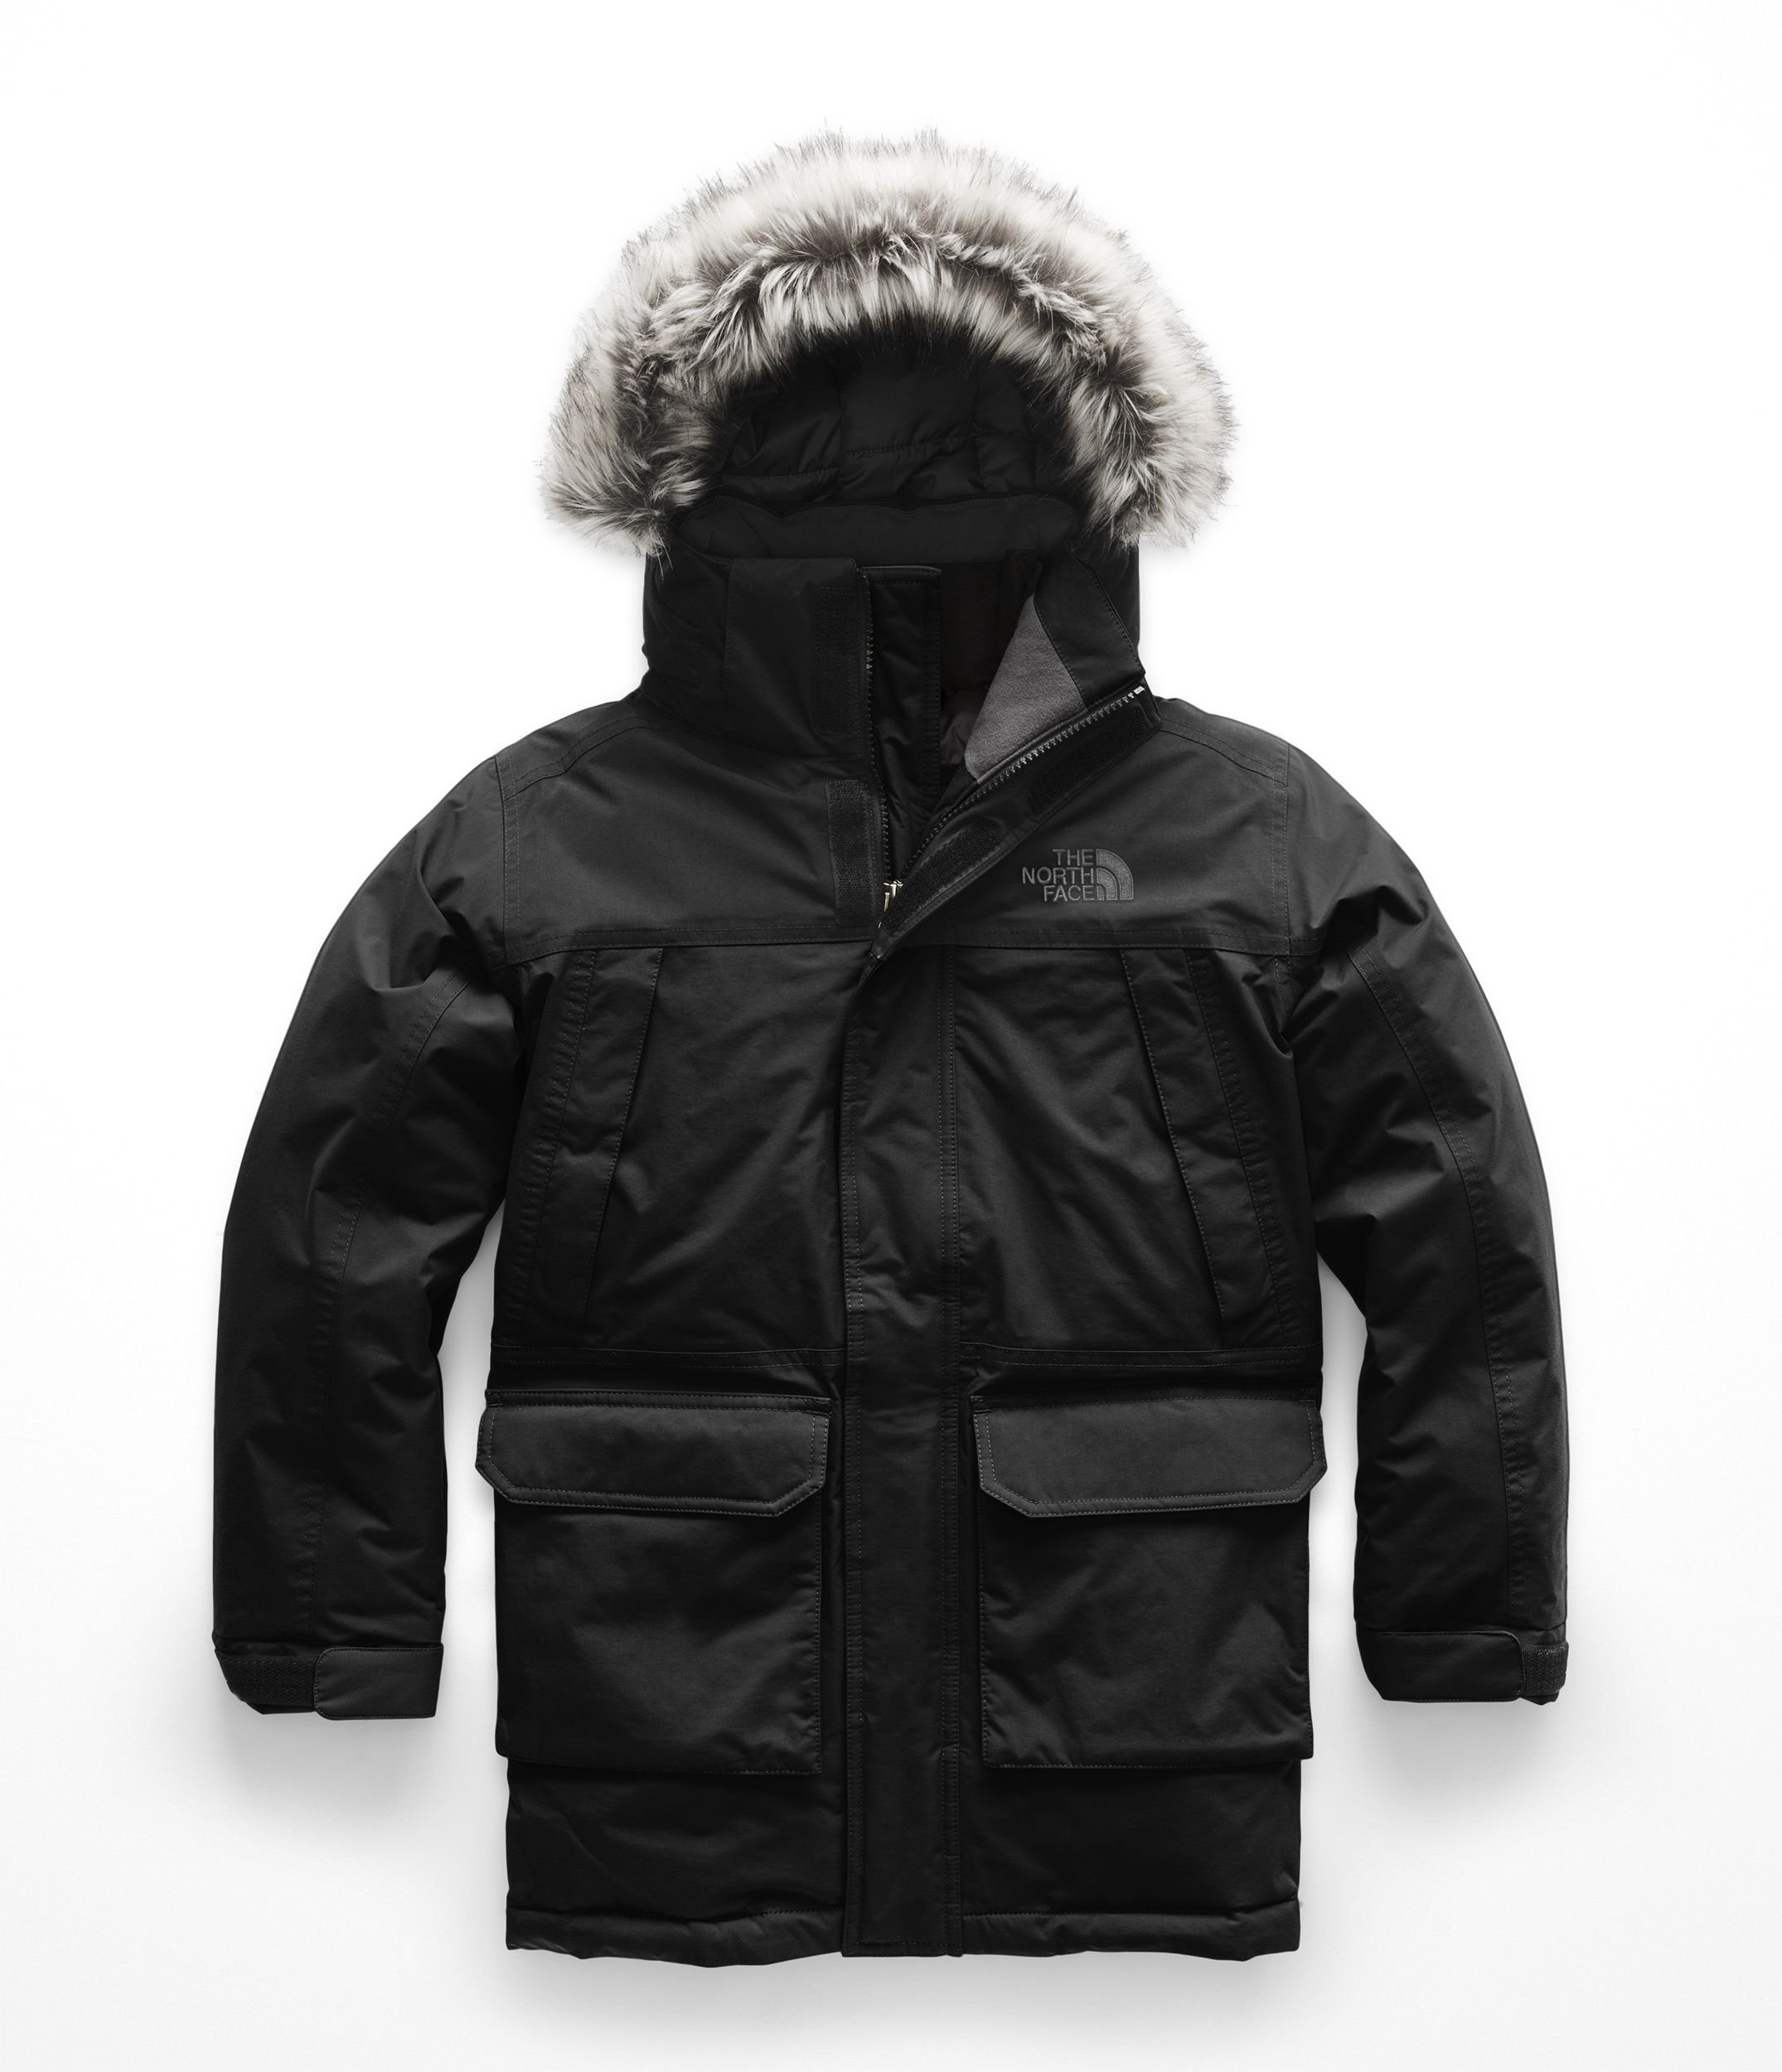 The North Face Kids Boy's McMurdo Down Parka (Little Kids/Big Kids) TNF Black/TNF Black Small